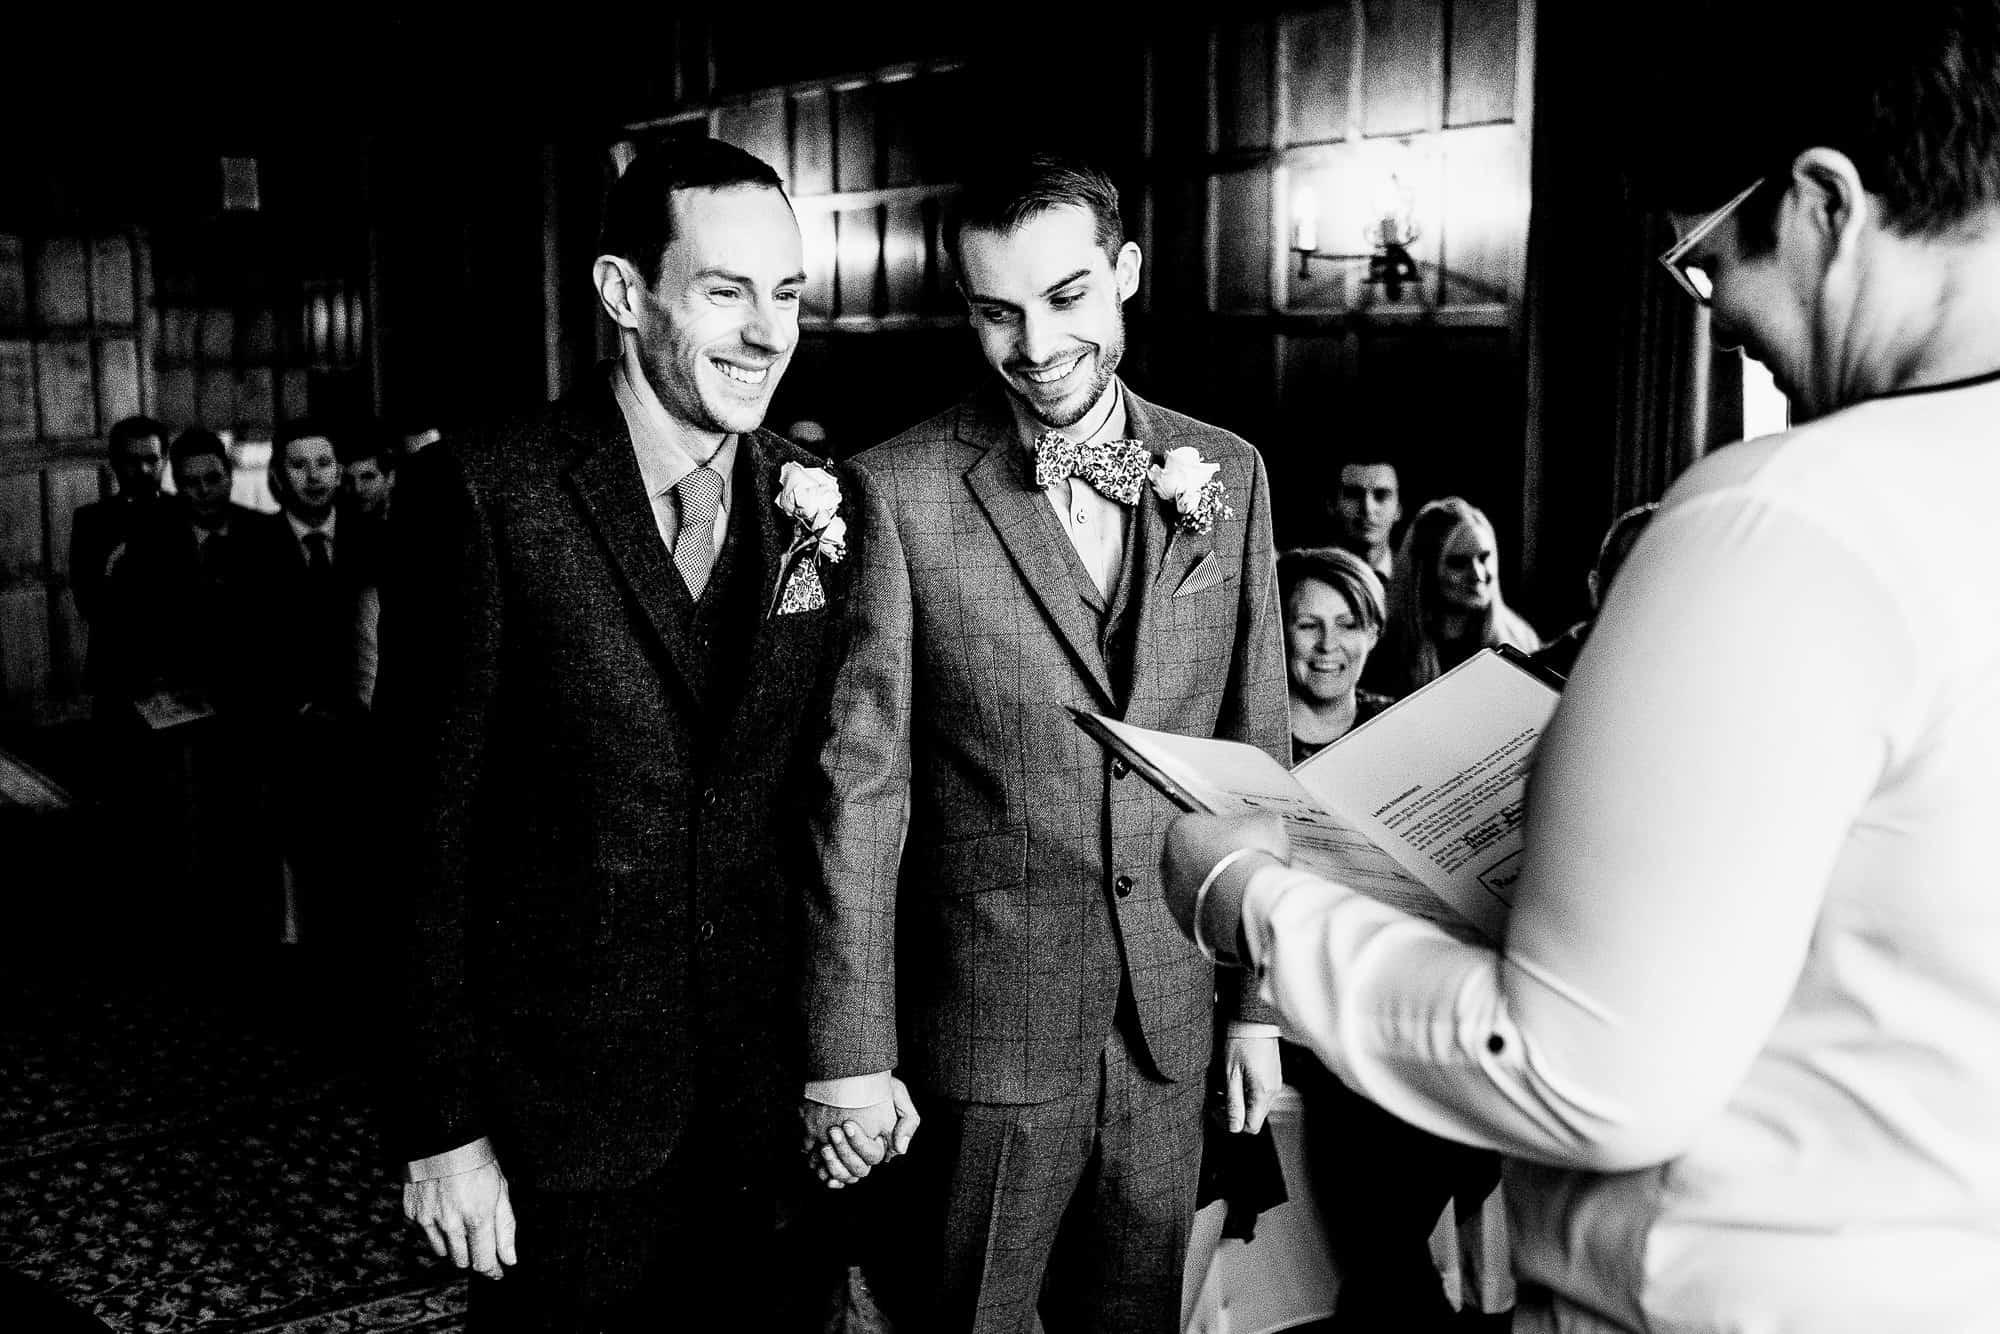 lympne-castle-wedding-photographer-matt-tyler-0013